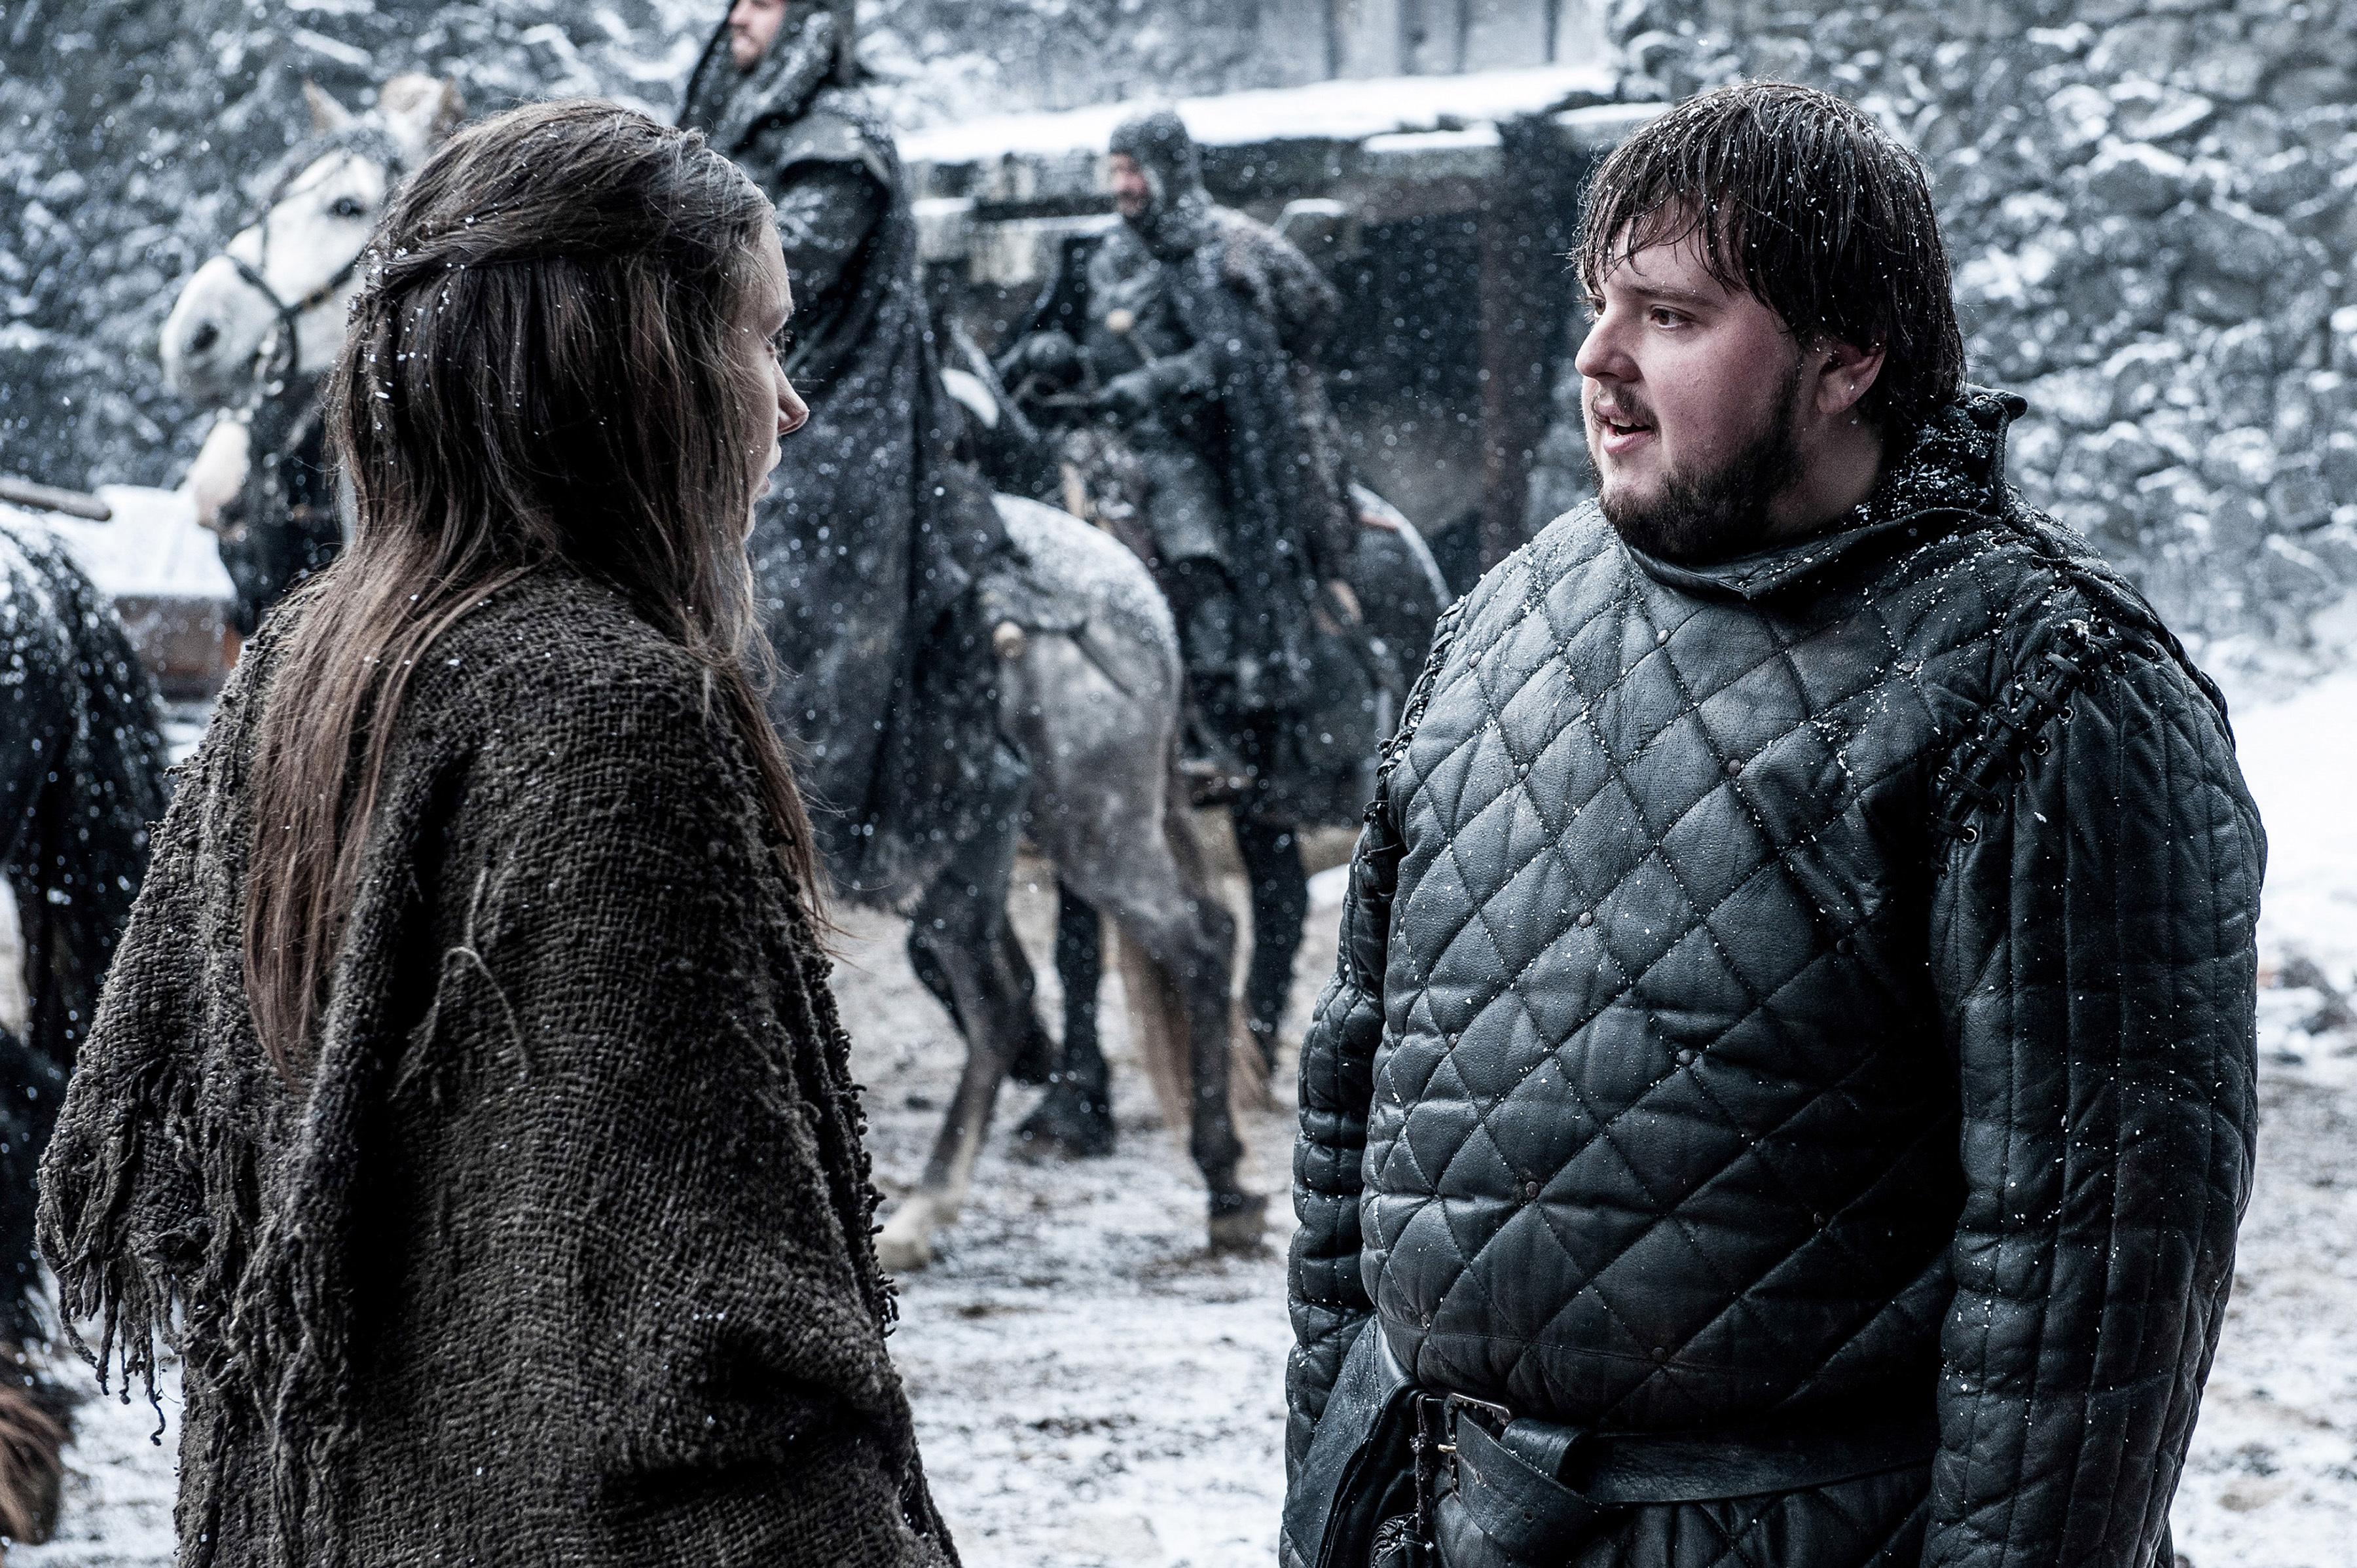 Hannah Murray and John Bradley in Game of Thrones